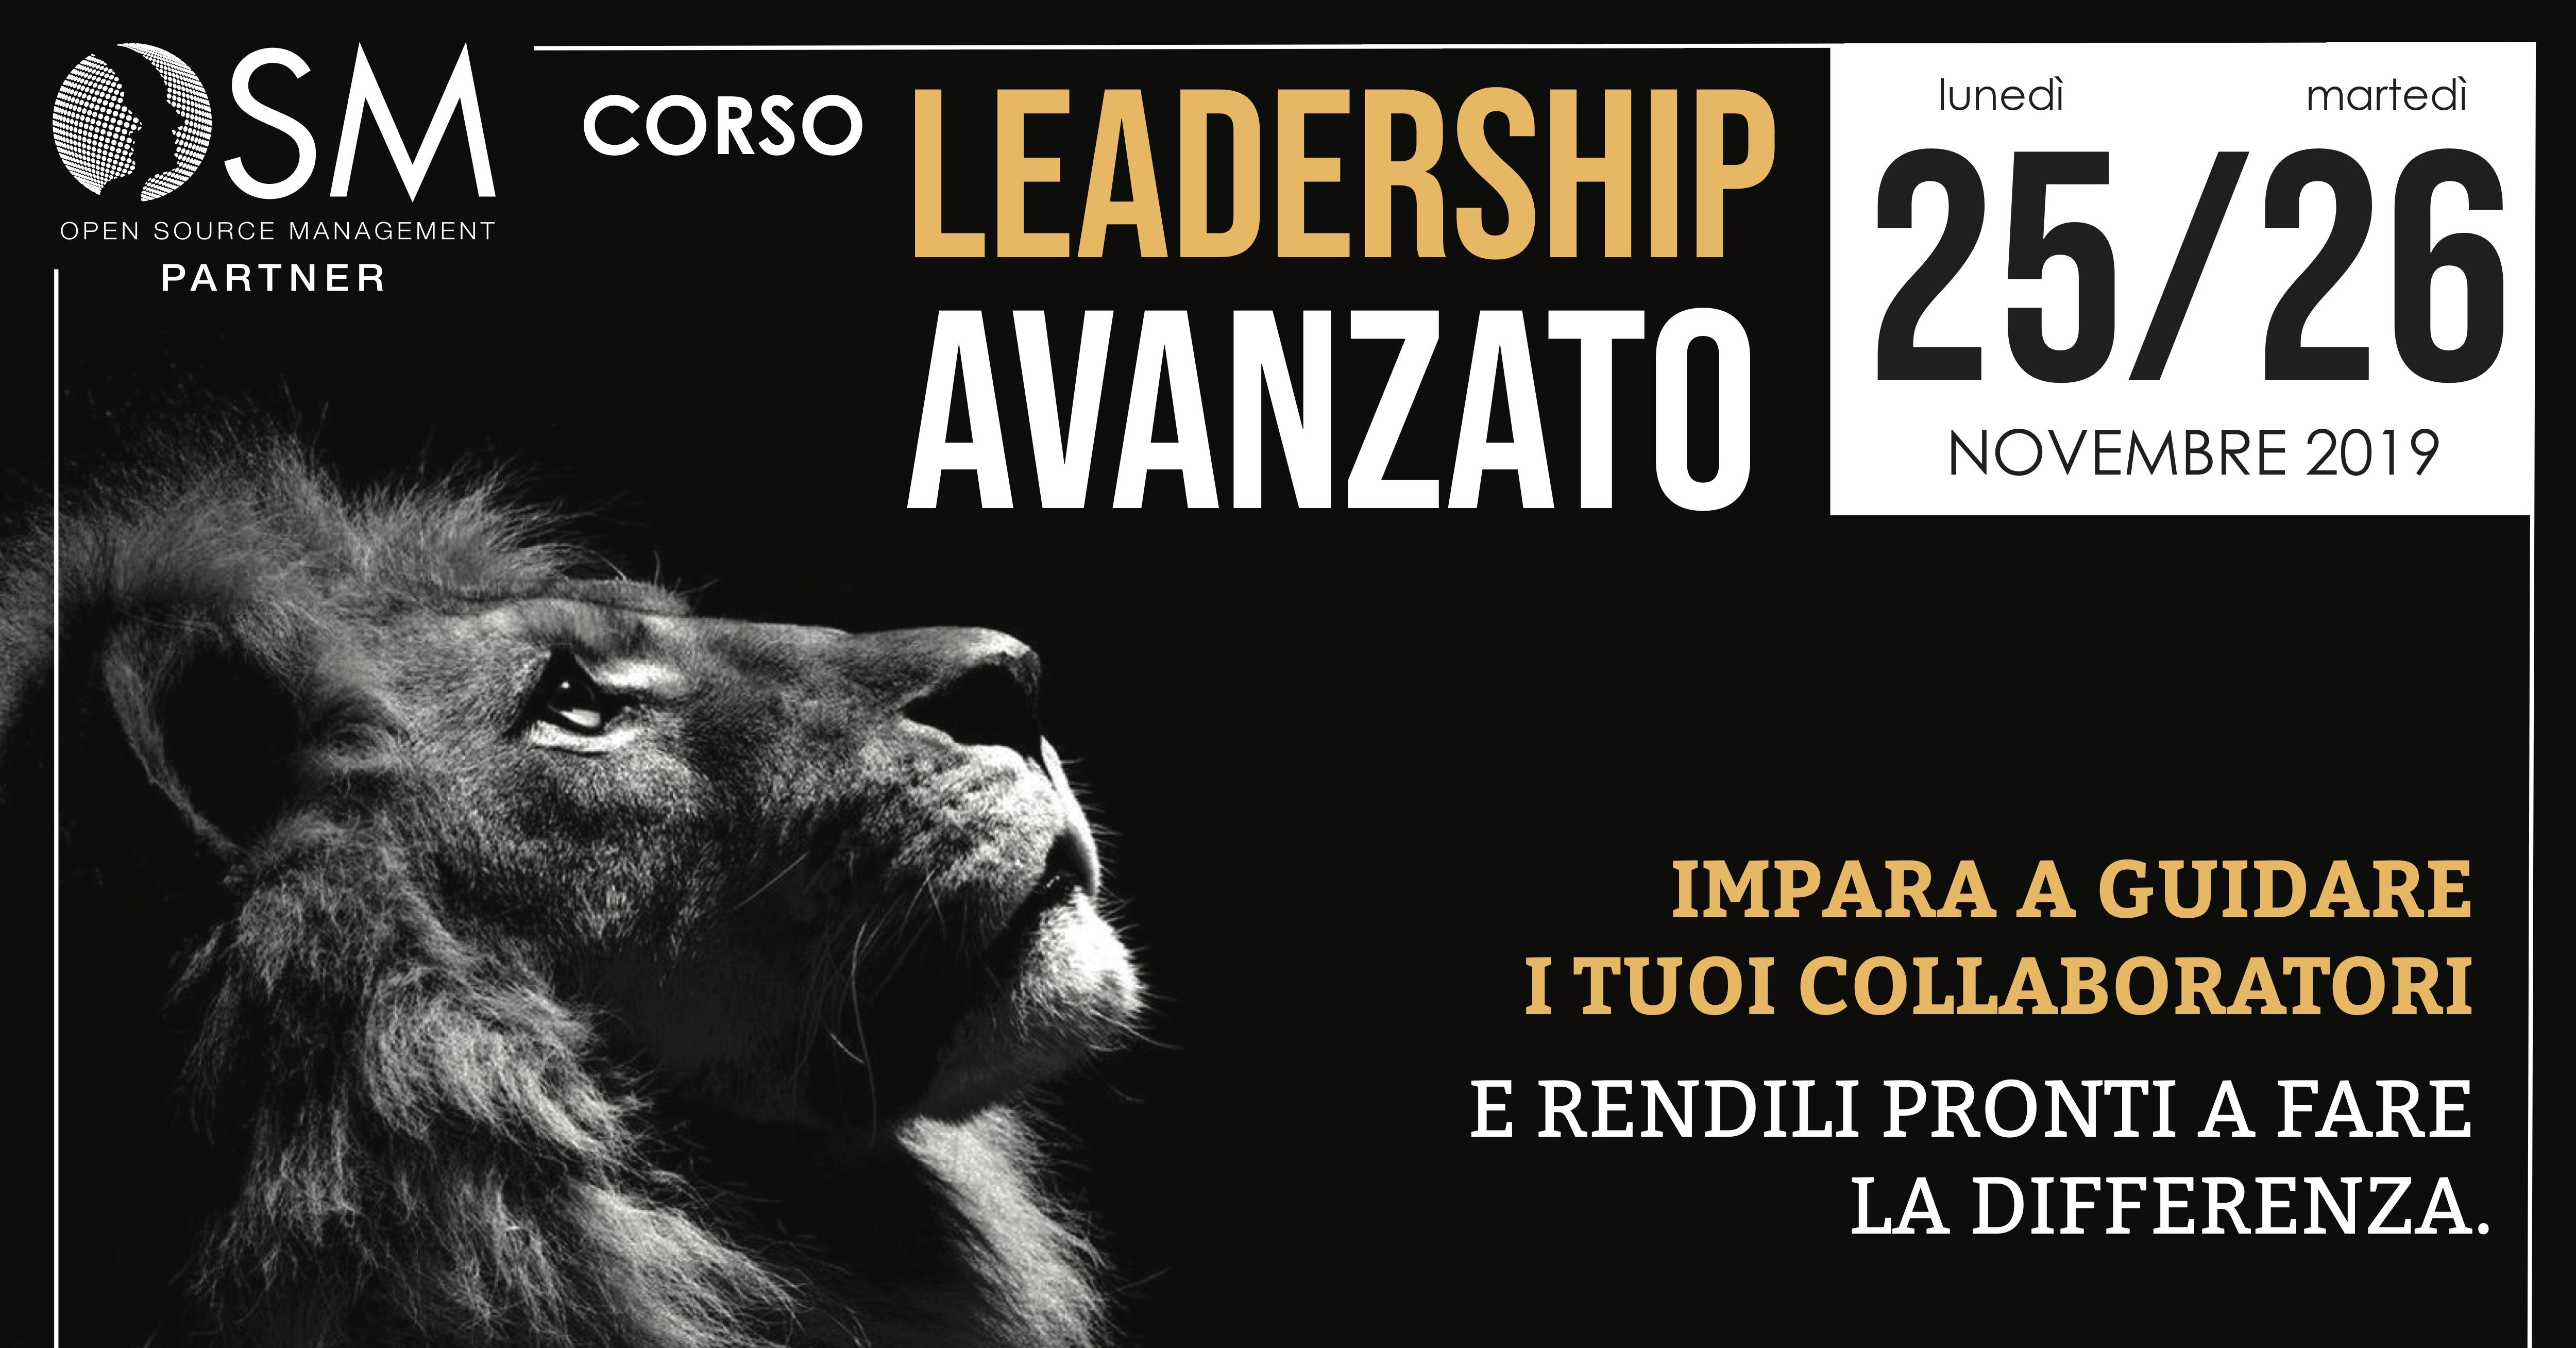 Corso Leadership Avanzato - 25 e 26 Novembre 2019